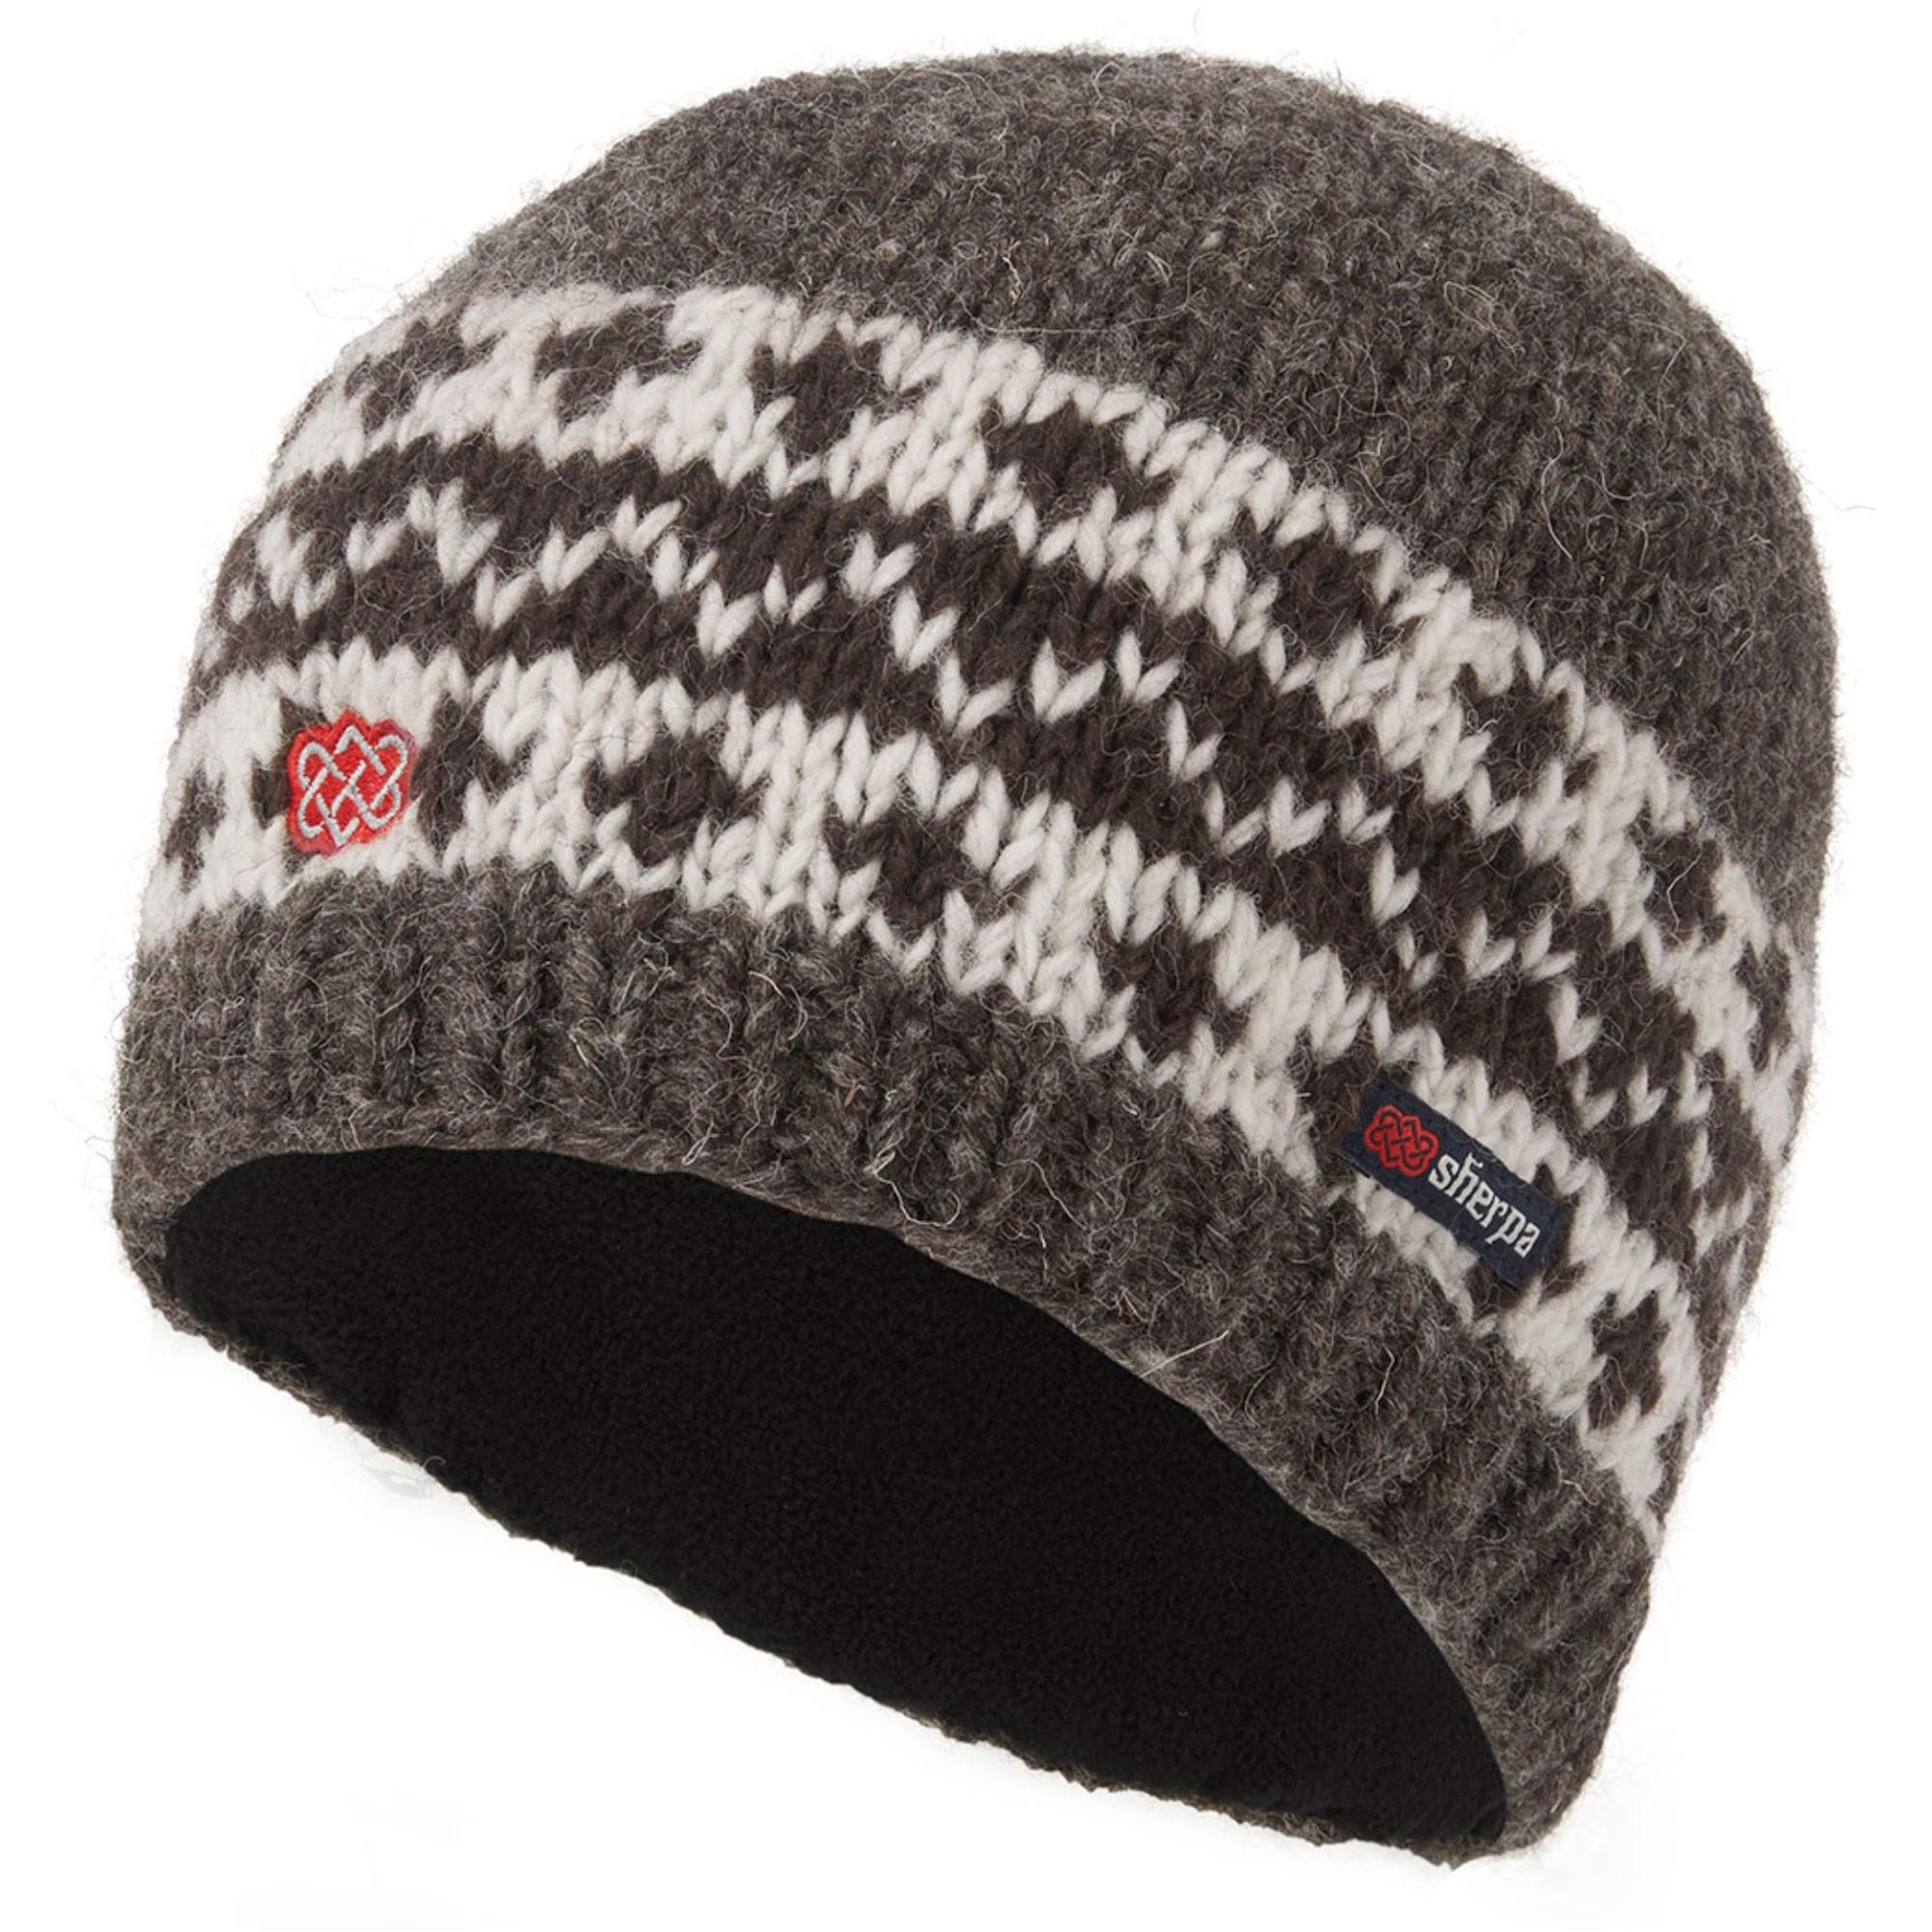 Sherpa-Adventure-Gear-Khedup-Hat-Maato-Brown-W17.